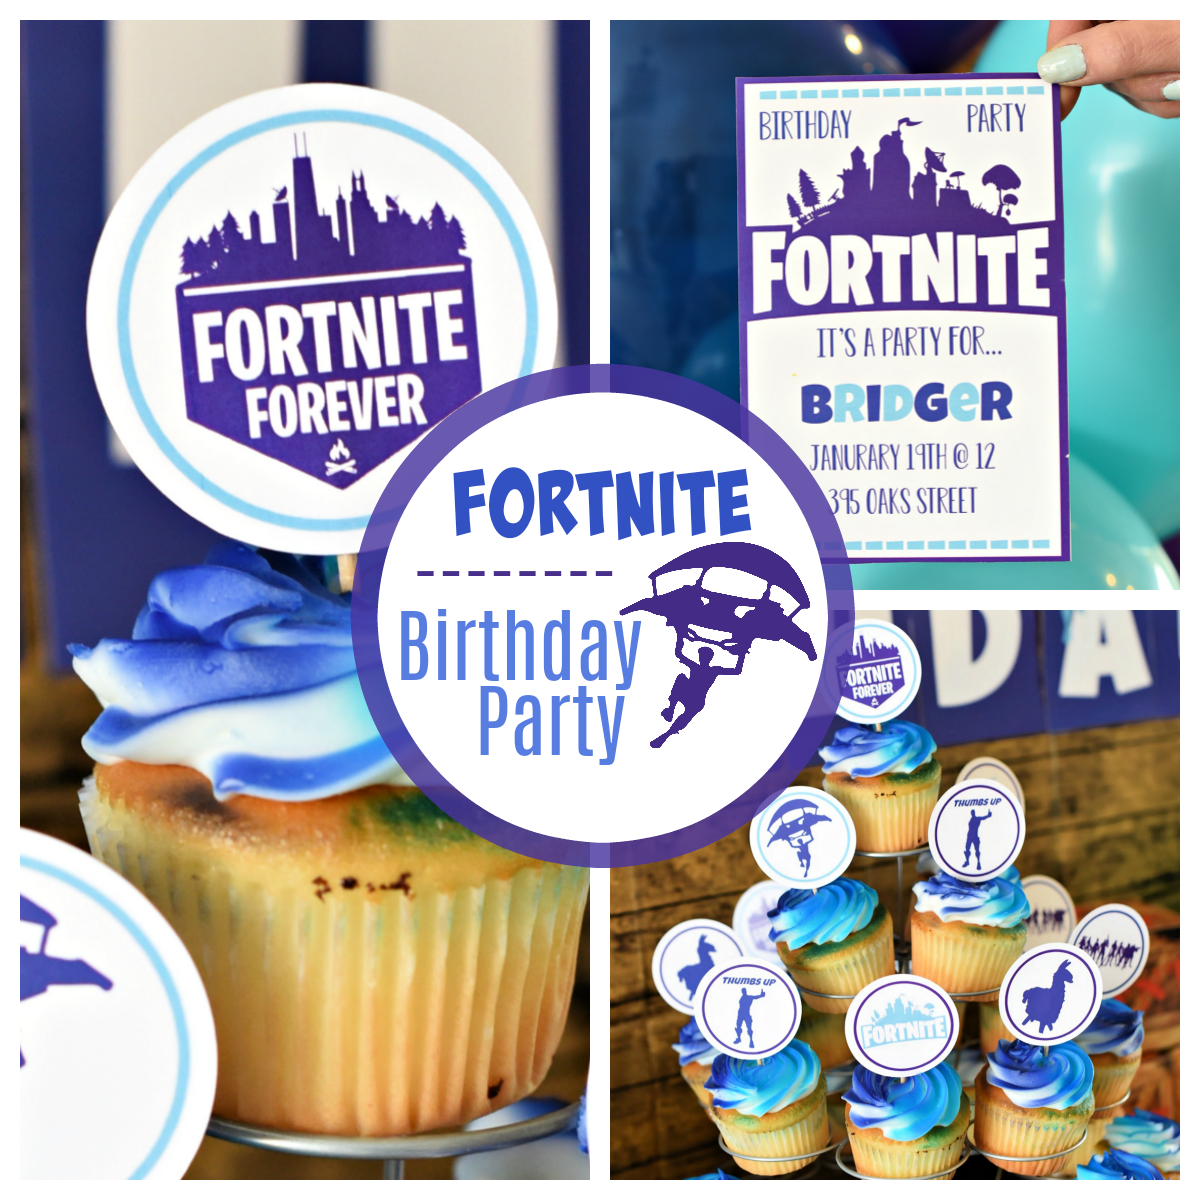 Fun Fortnite Birthday Party